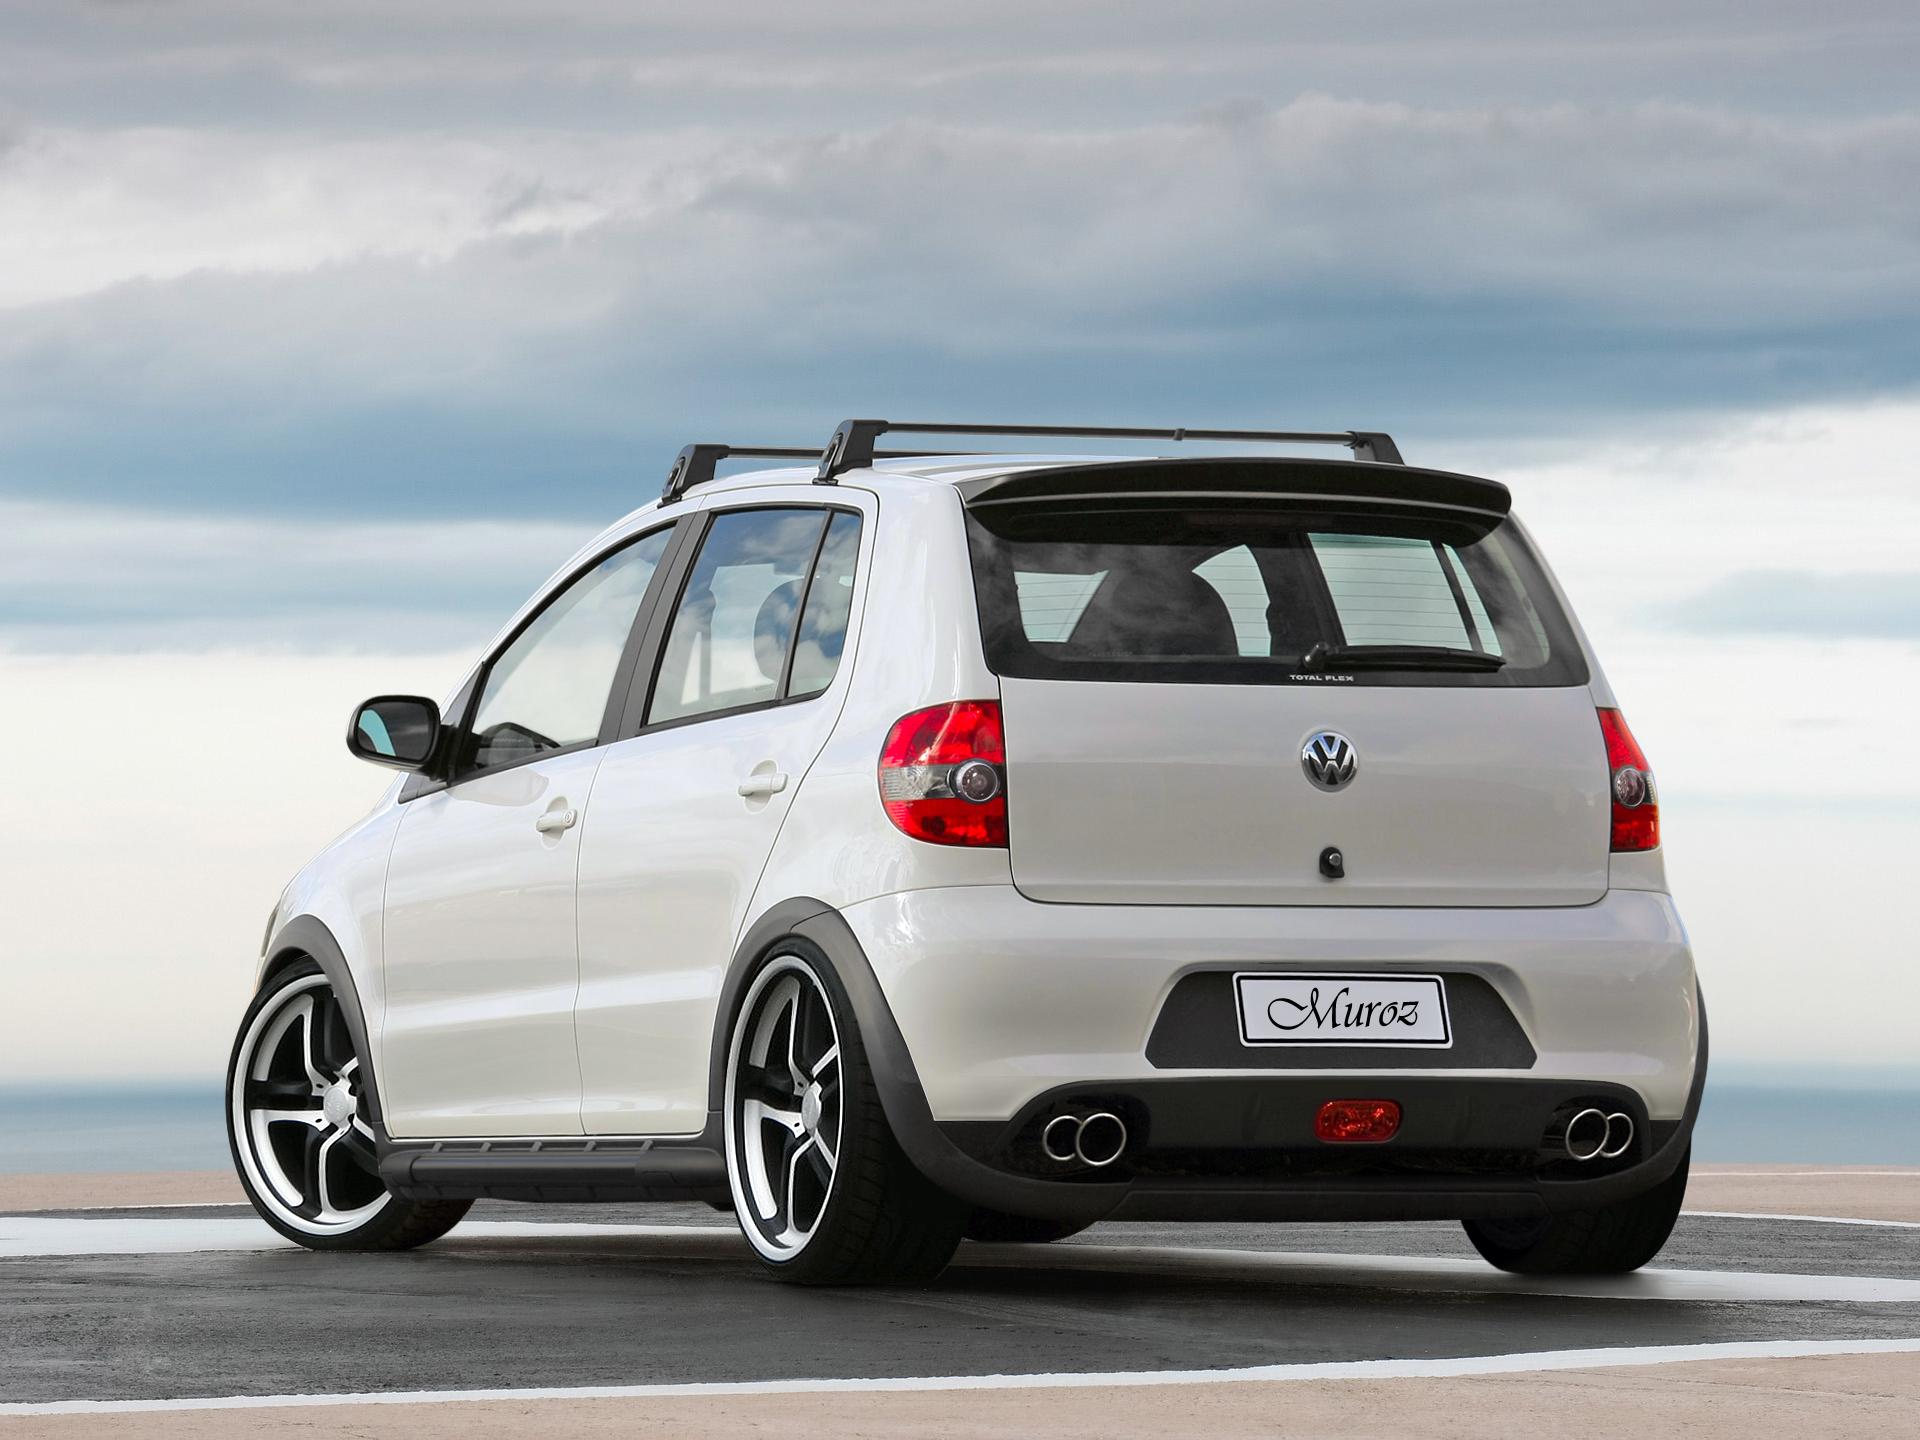 VW_Fox_Rear_by_Murillo.jpg